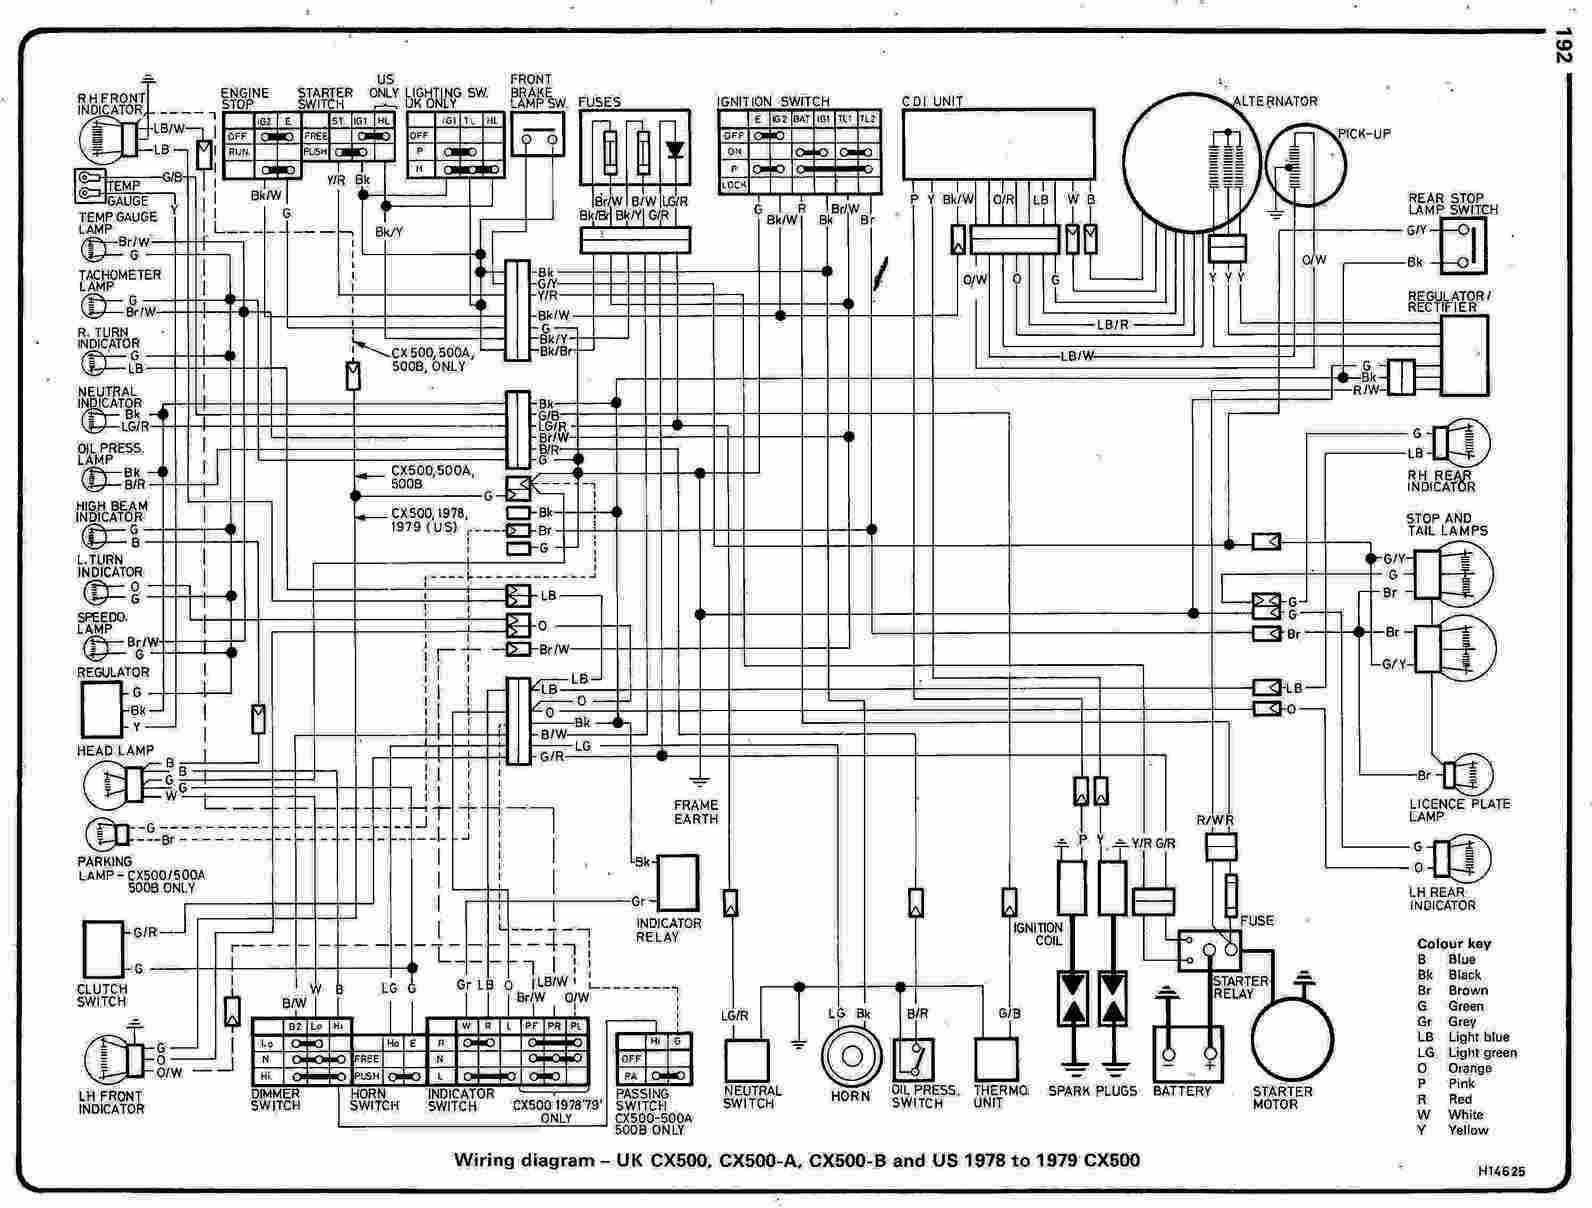 hight resolution of 1981 honda cx500 custom wiring diagram wiring diagram review 81 honda goldwing wiring diagram 81 honda wiring diagram